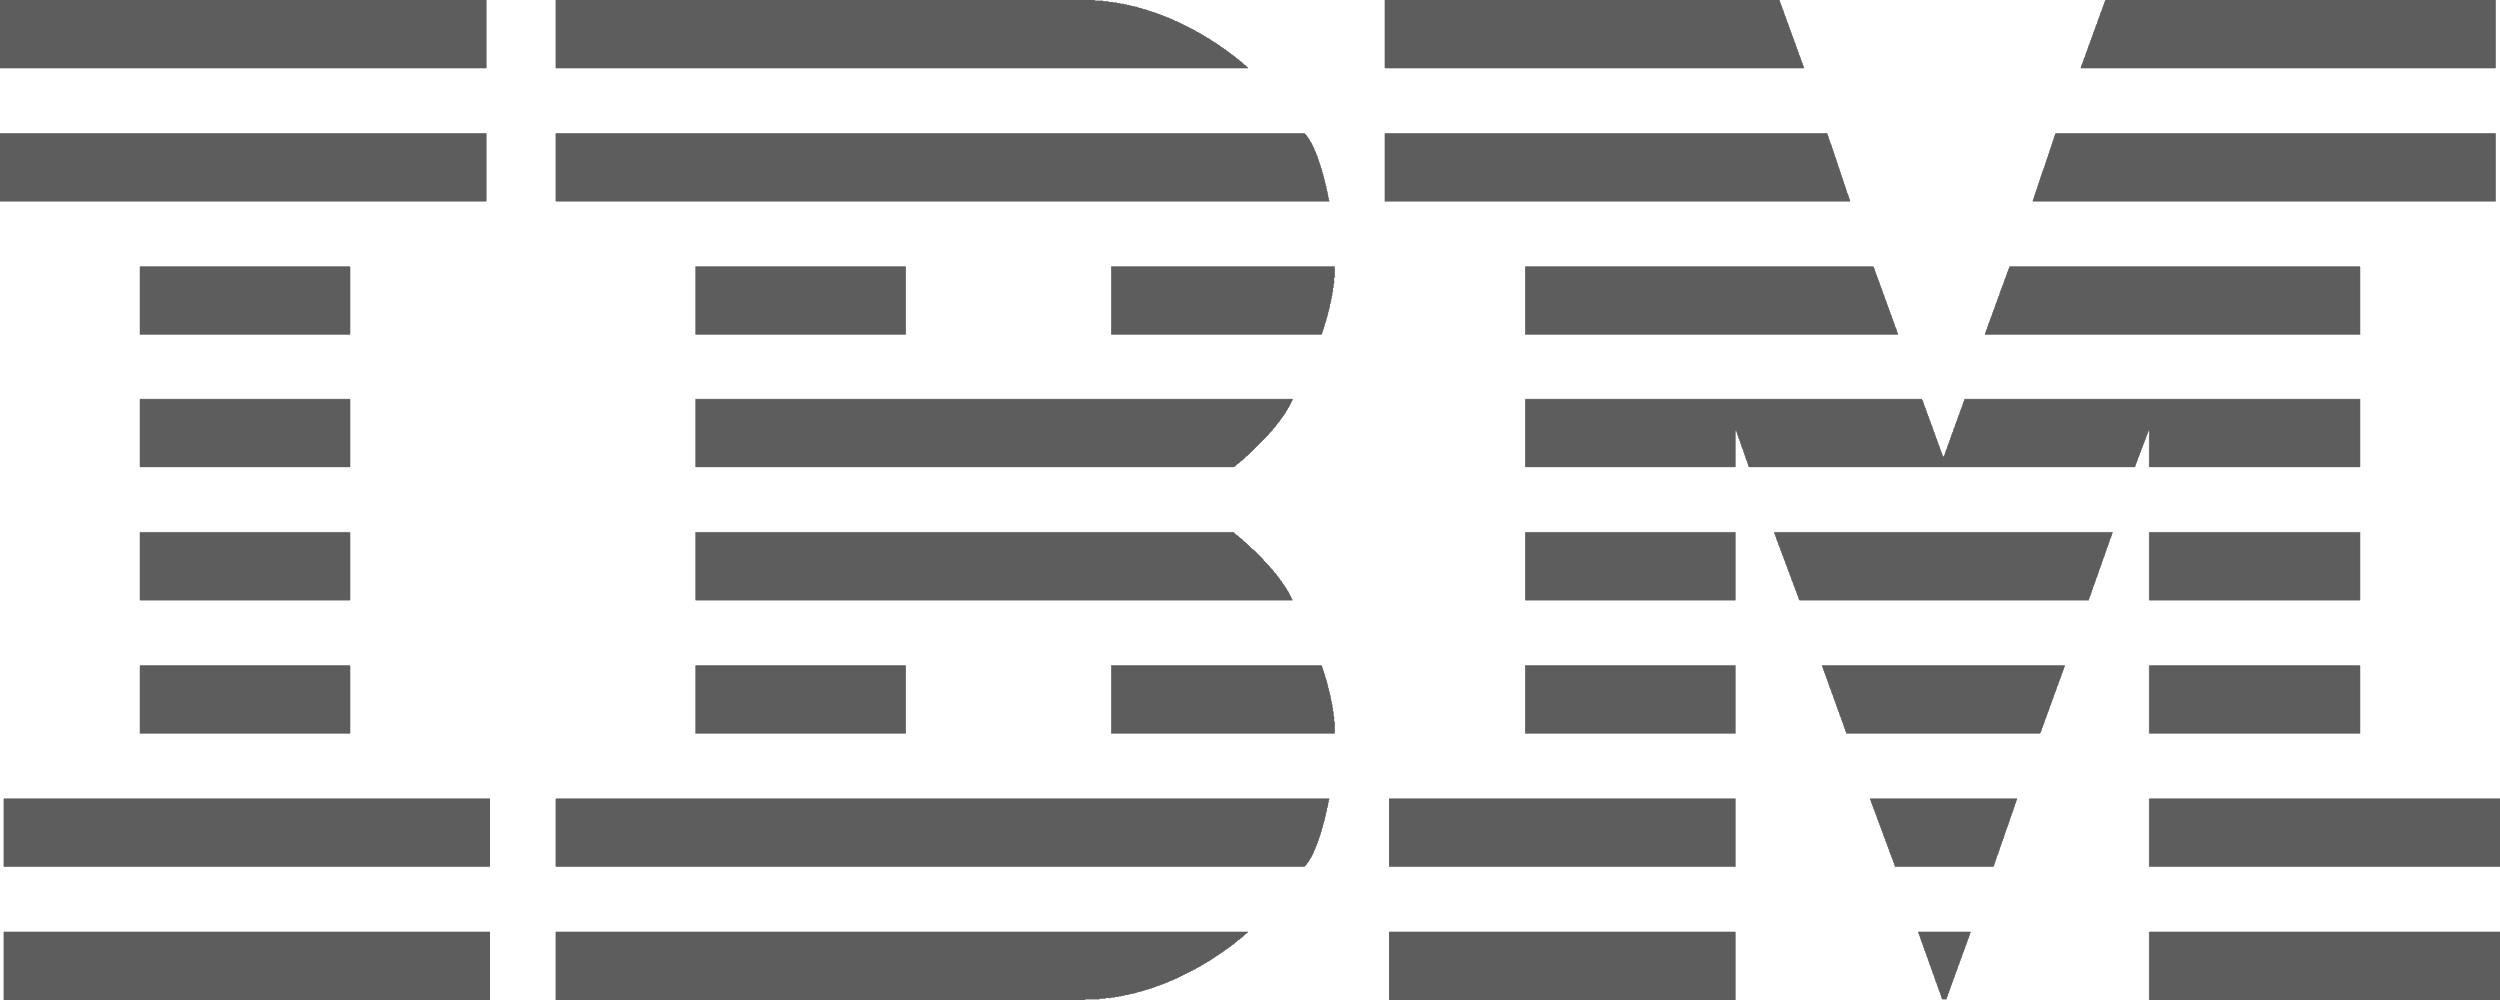 8b5fdd11.IBM_Logo_Dark.png